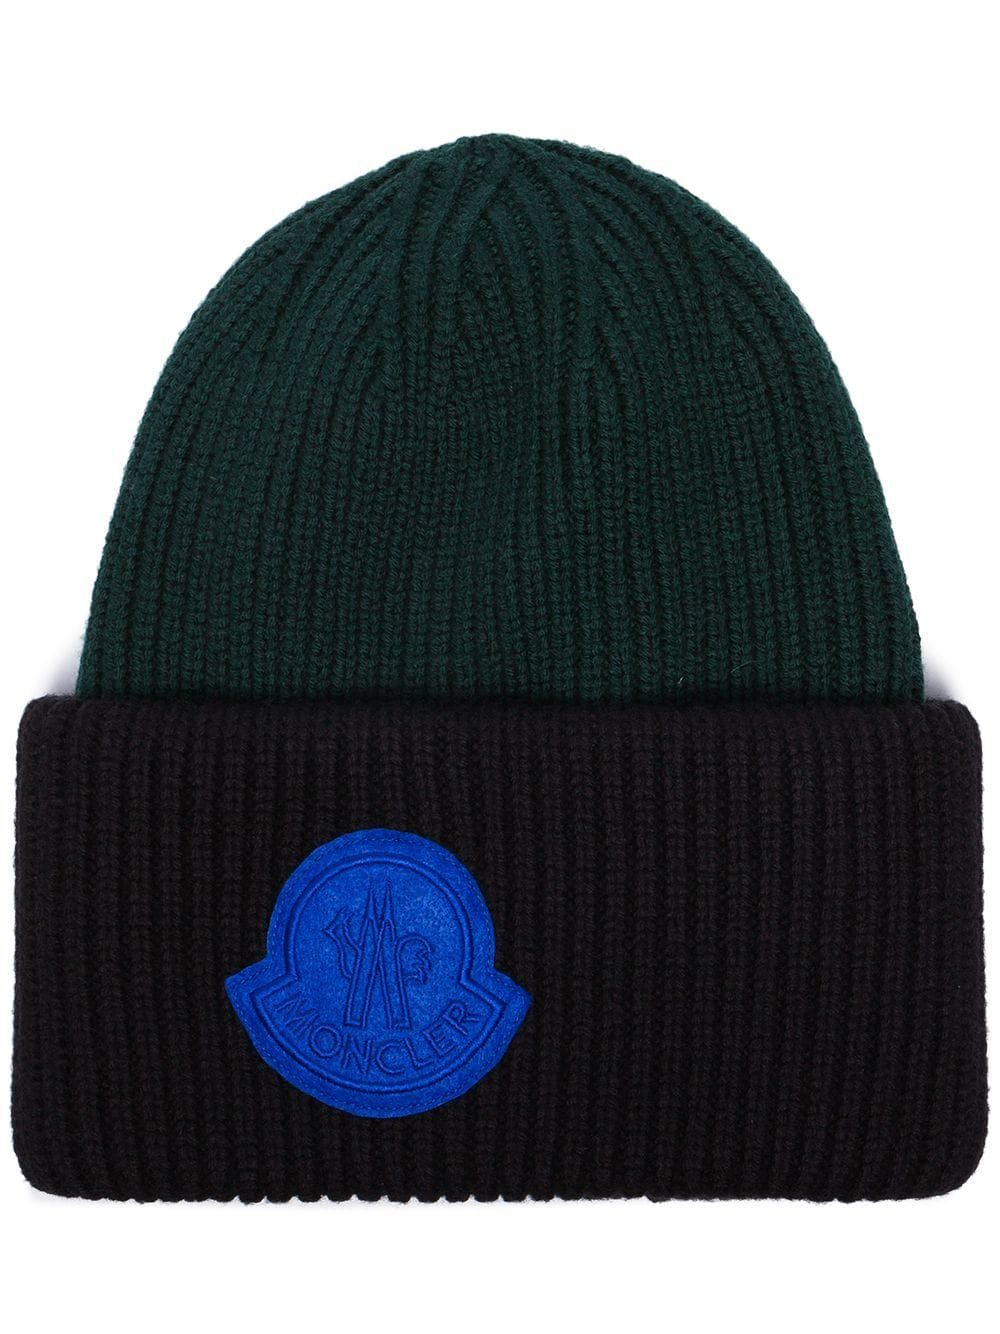 Moncler Moncler Virgin Wool Beanie Hat Black Moncler Wool Beanie Beanie Hats Beanie